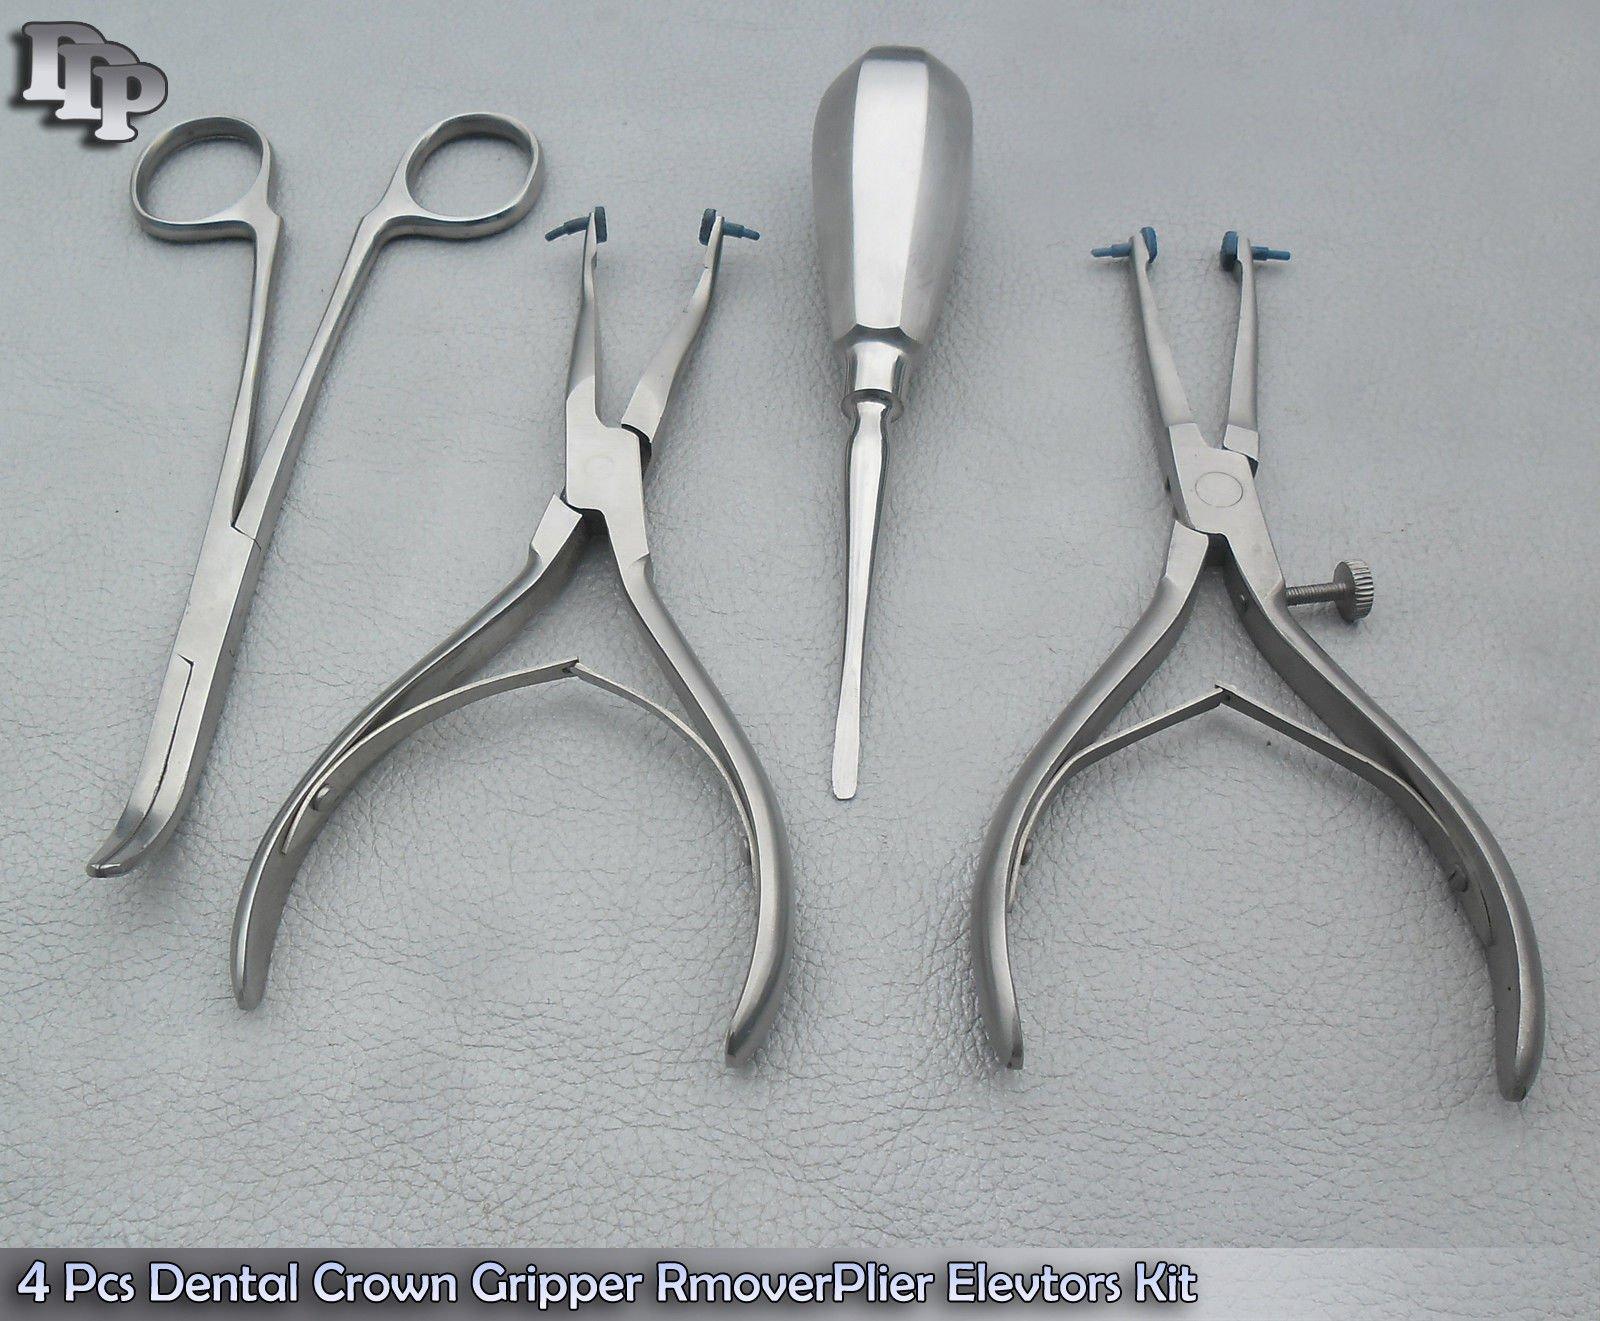 Set of 4 Pcs Dental Crown Gripper Remover Pliers Elevators Kit